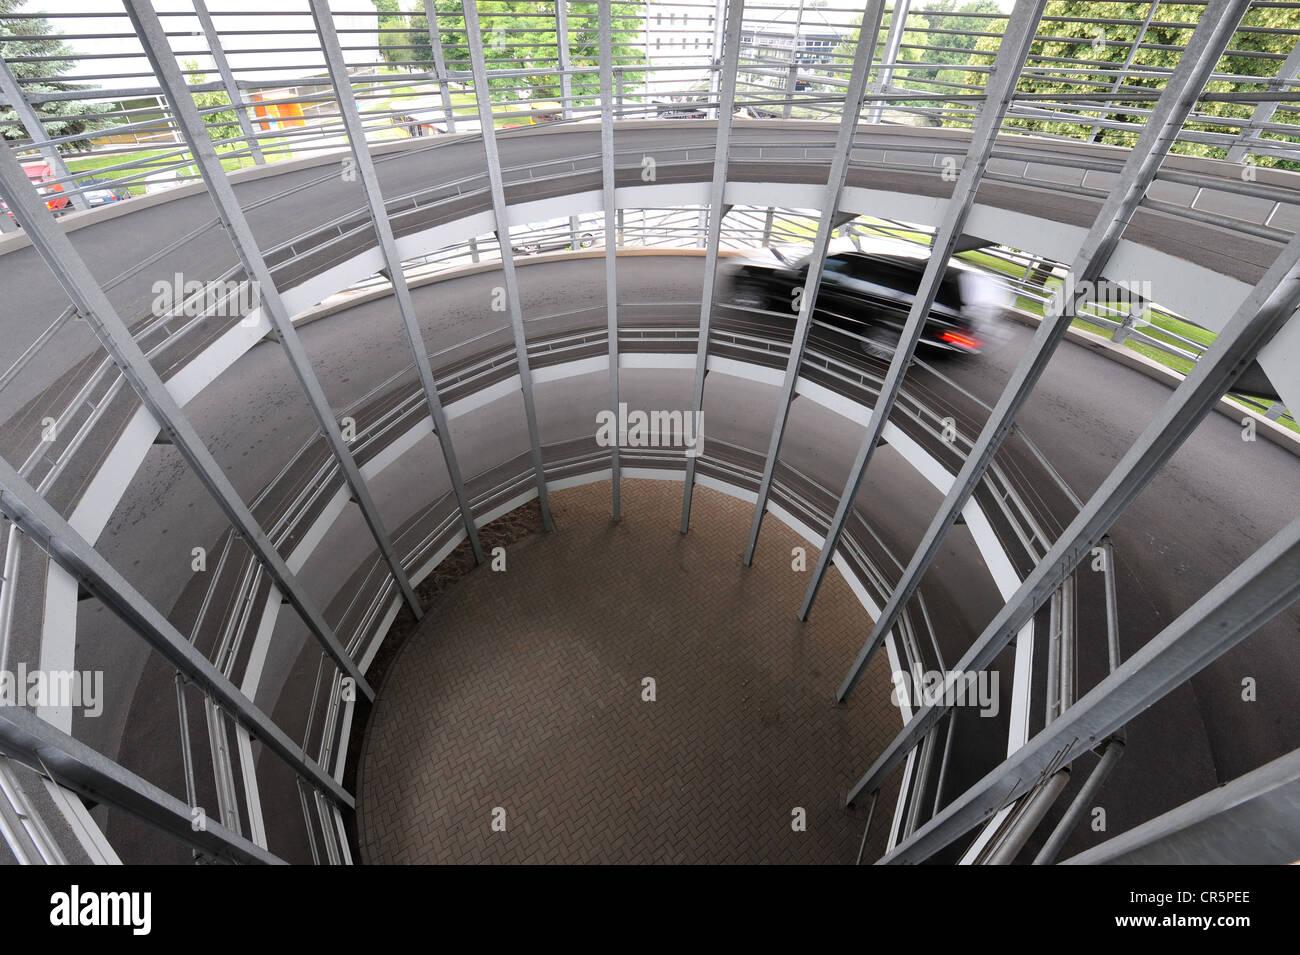 Parkhaus Am Stadion, stadium car park, Steigerwald Stadium, Erfurt, Thuringia, Germany, Europe - Stock Image